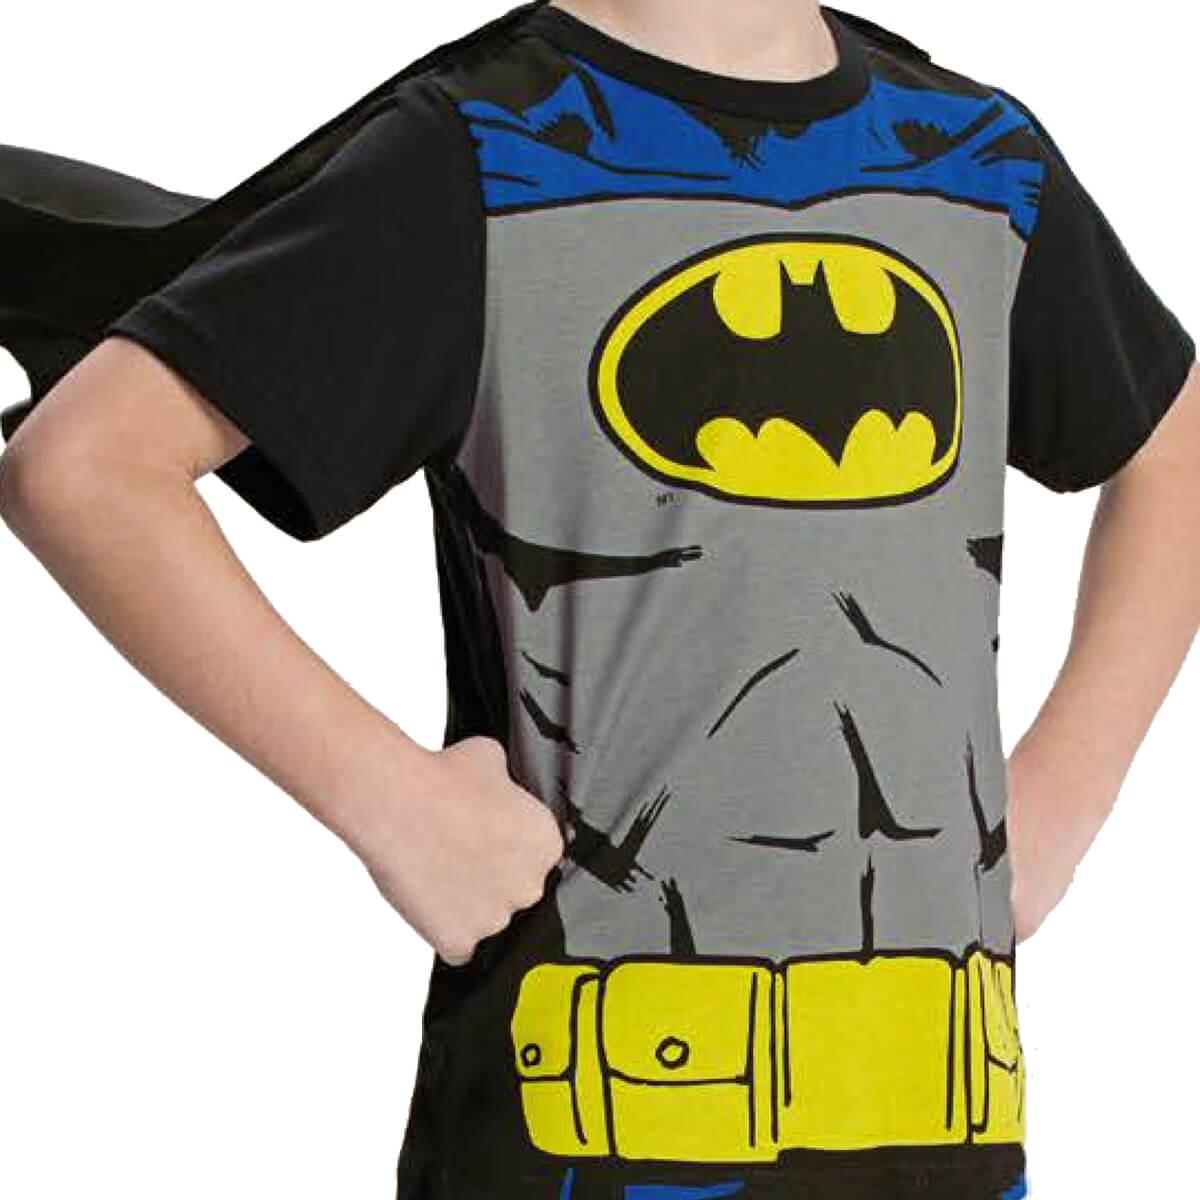 Camiseta Infantil Menino Batman com Capa